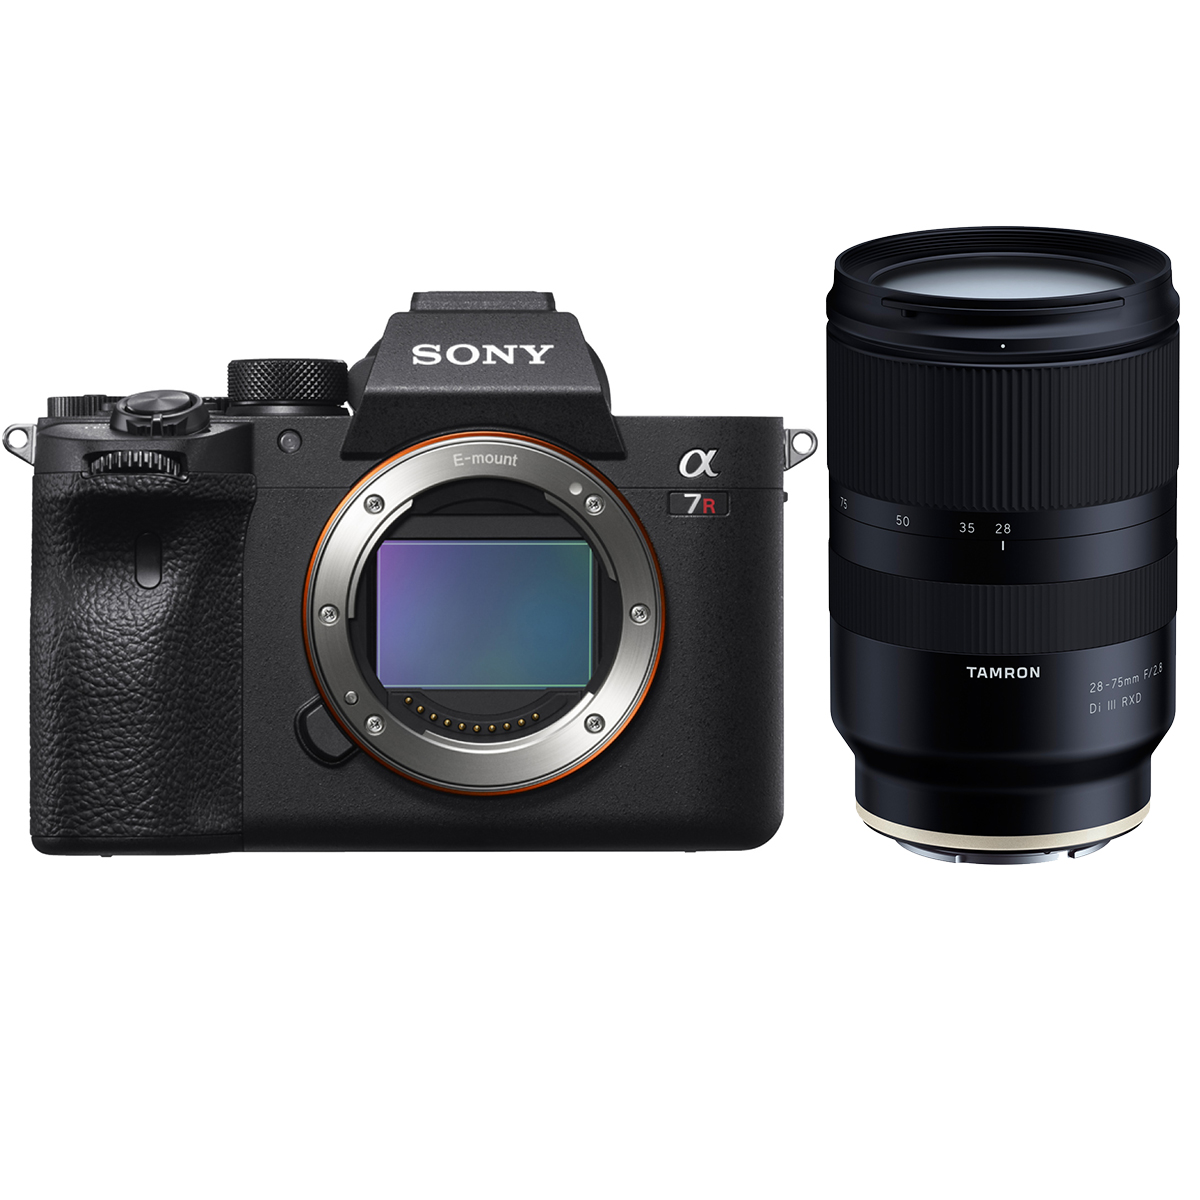 Sony Alpha 7R III A + Tamron 28-75 mm 1:2,8 Di III RXD